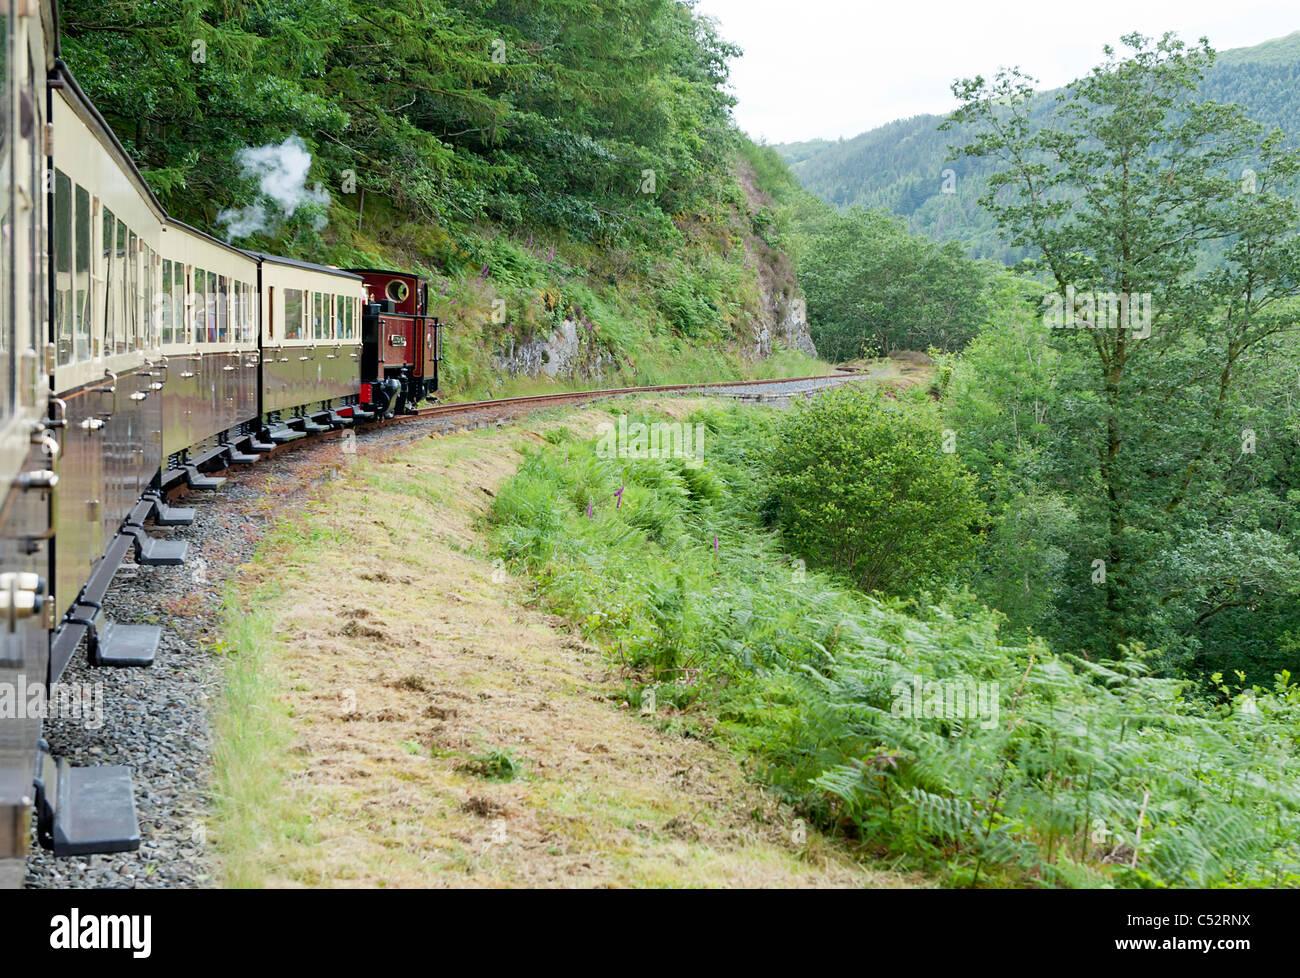 Vale of Rheidol Railway line between Aberystwyth and Devils Bridge, Wales, United Kingdom - Stock Image